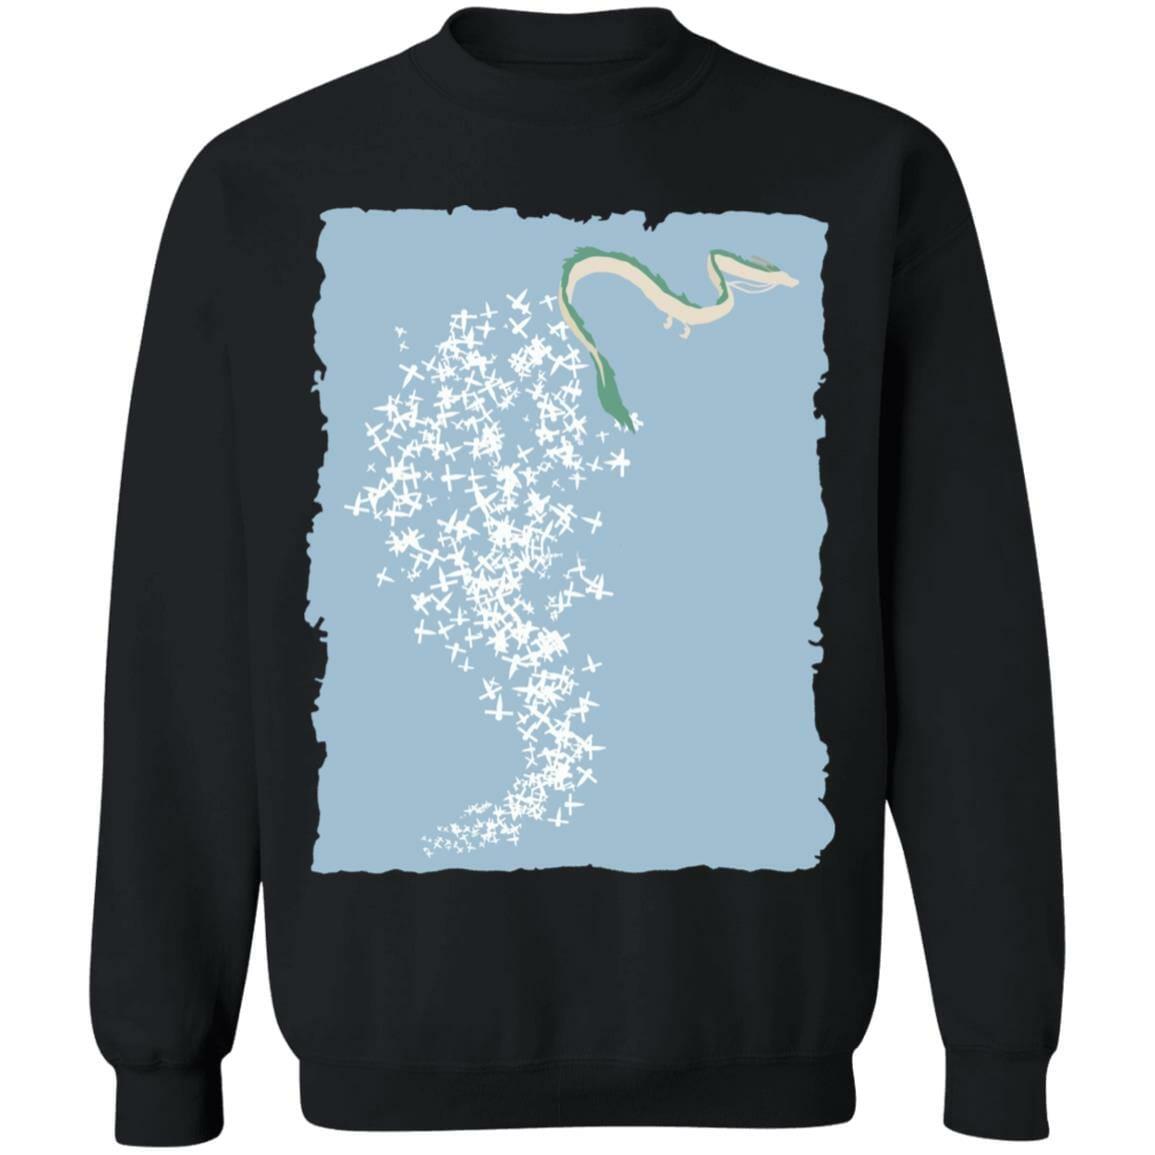 Spirited Away –  Flying Haku Dragon Sweatshirt